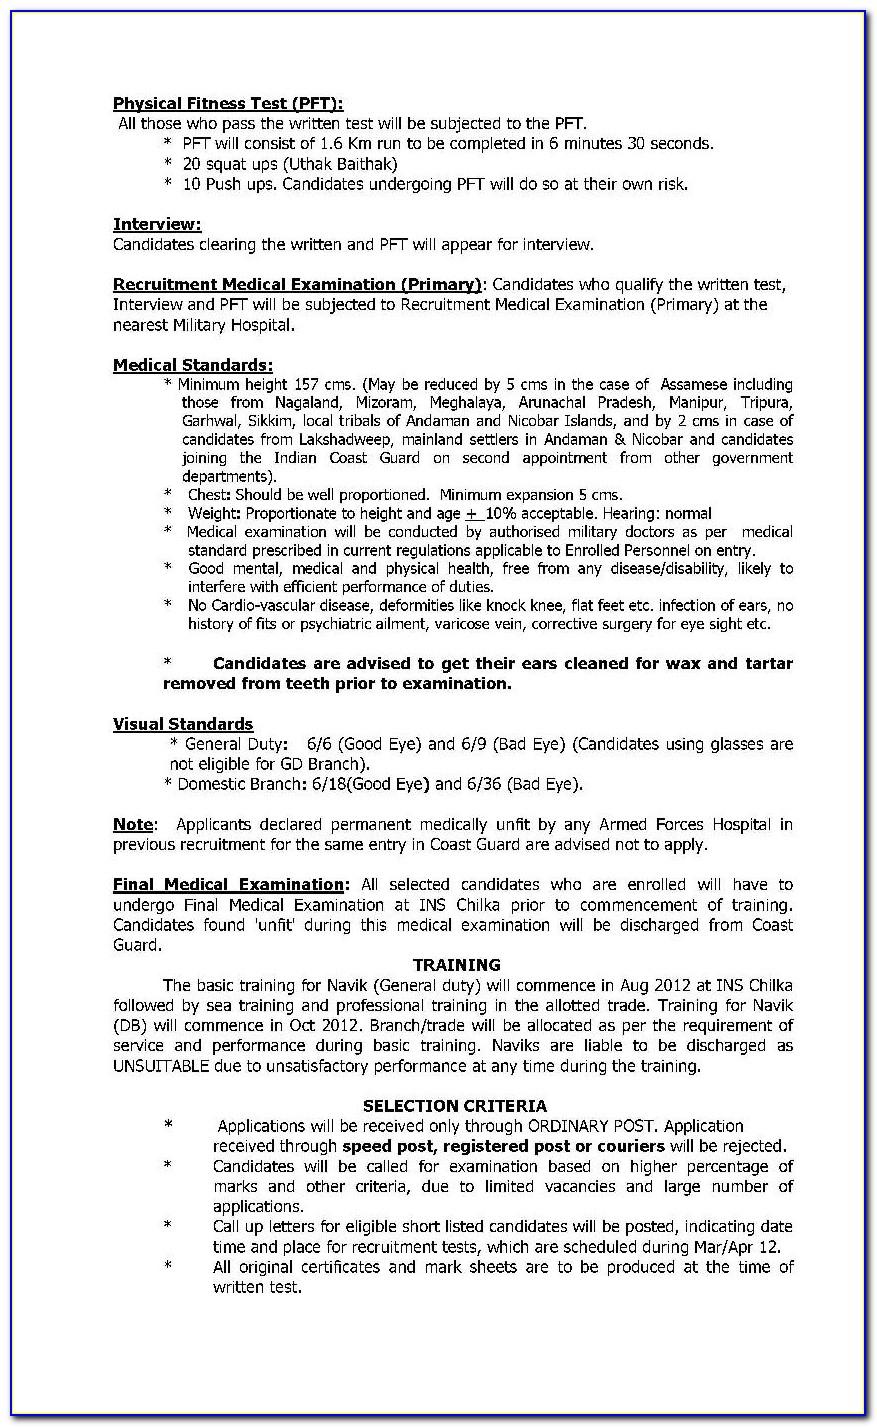 Uscg Medical Certificate Grace Period